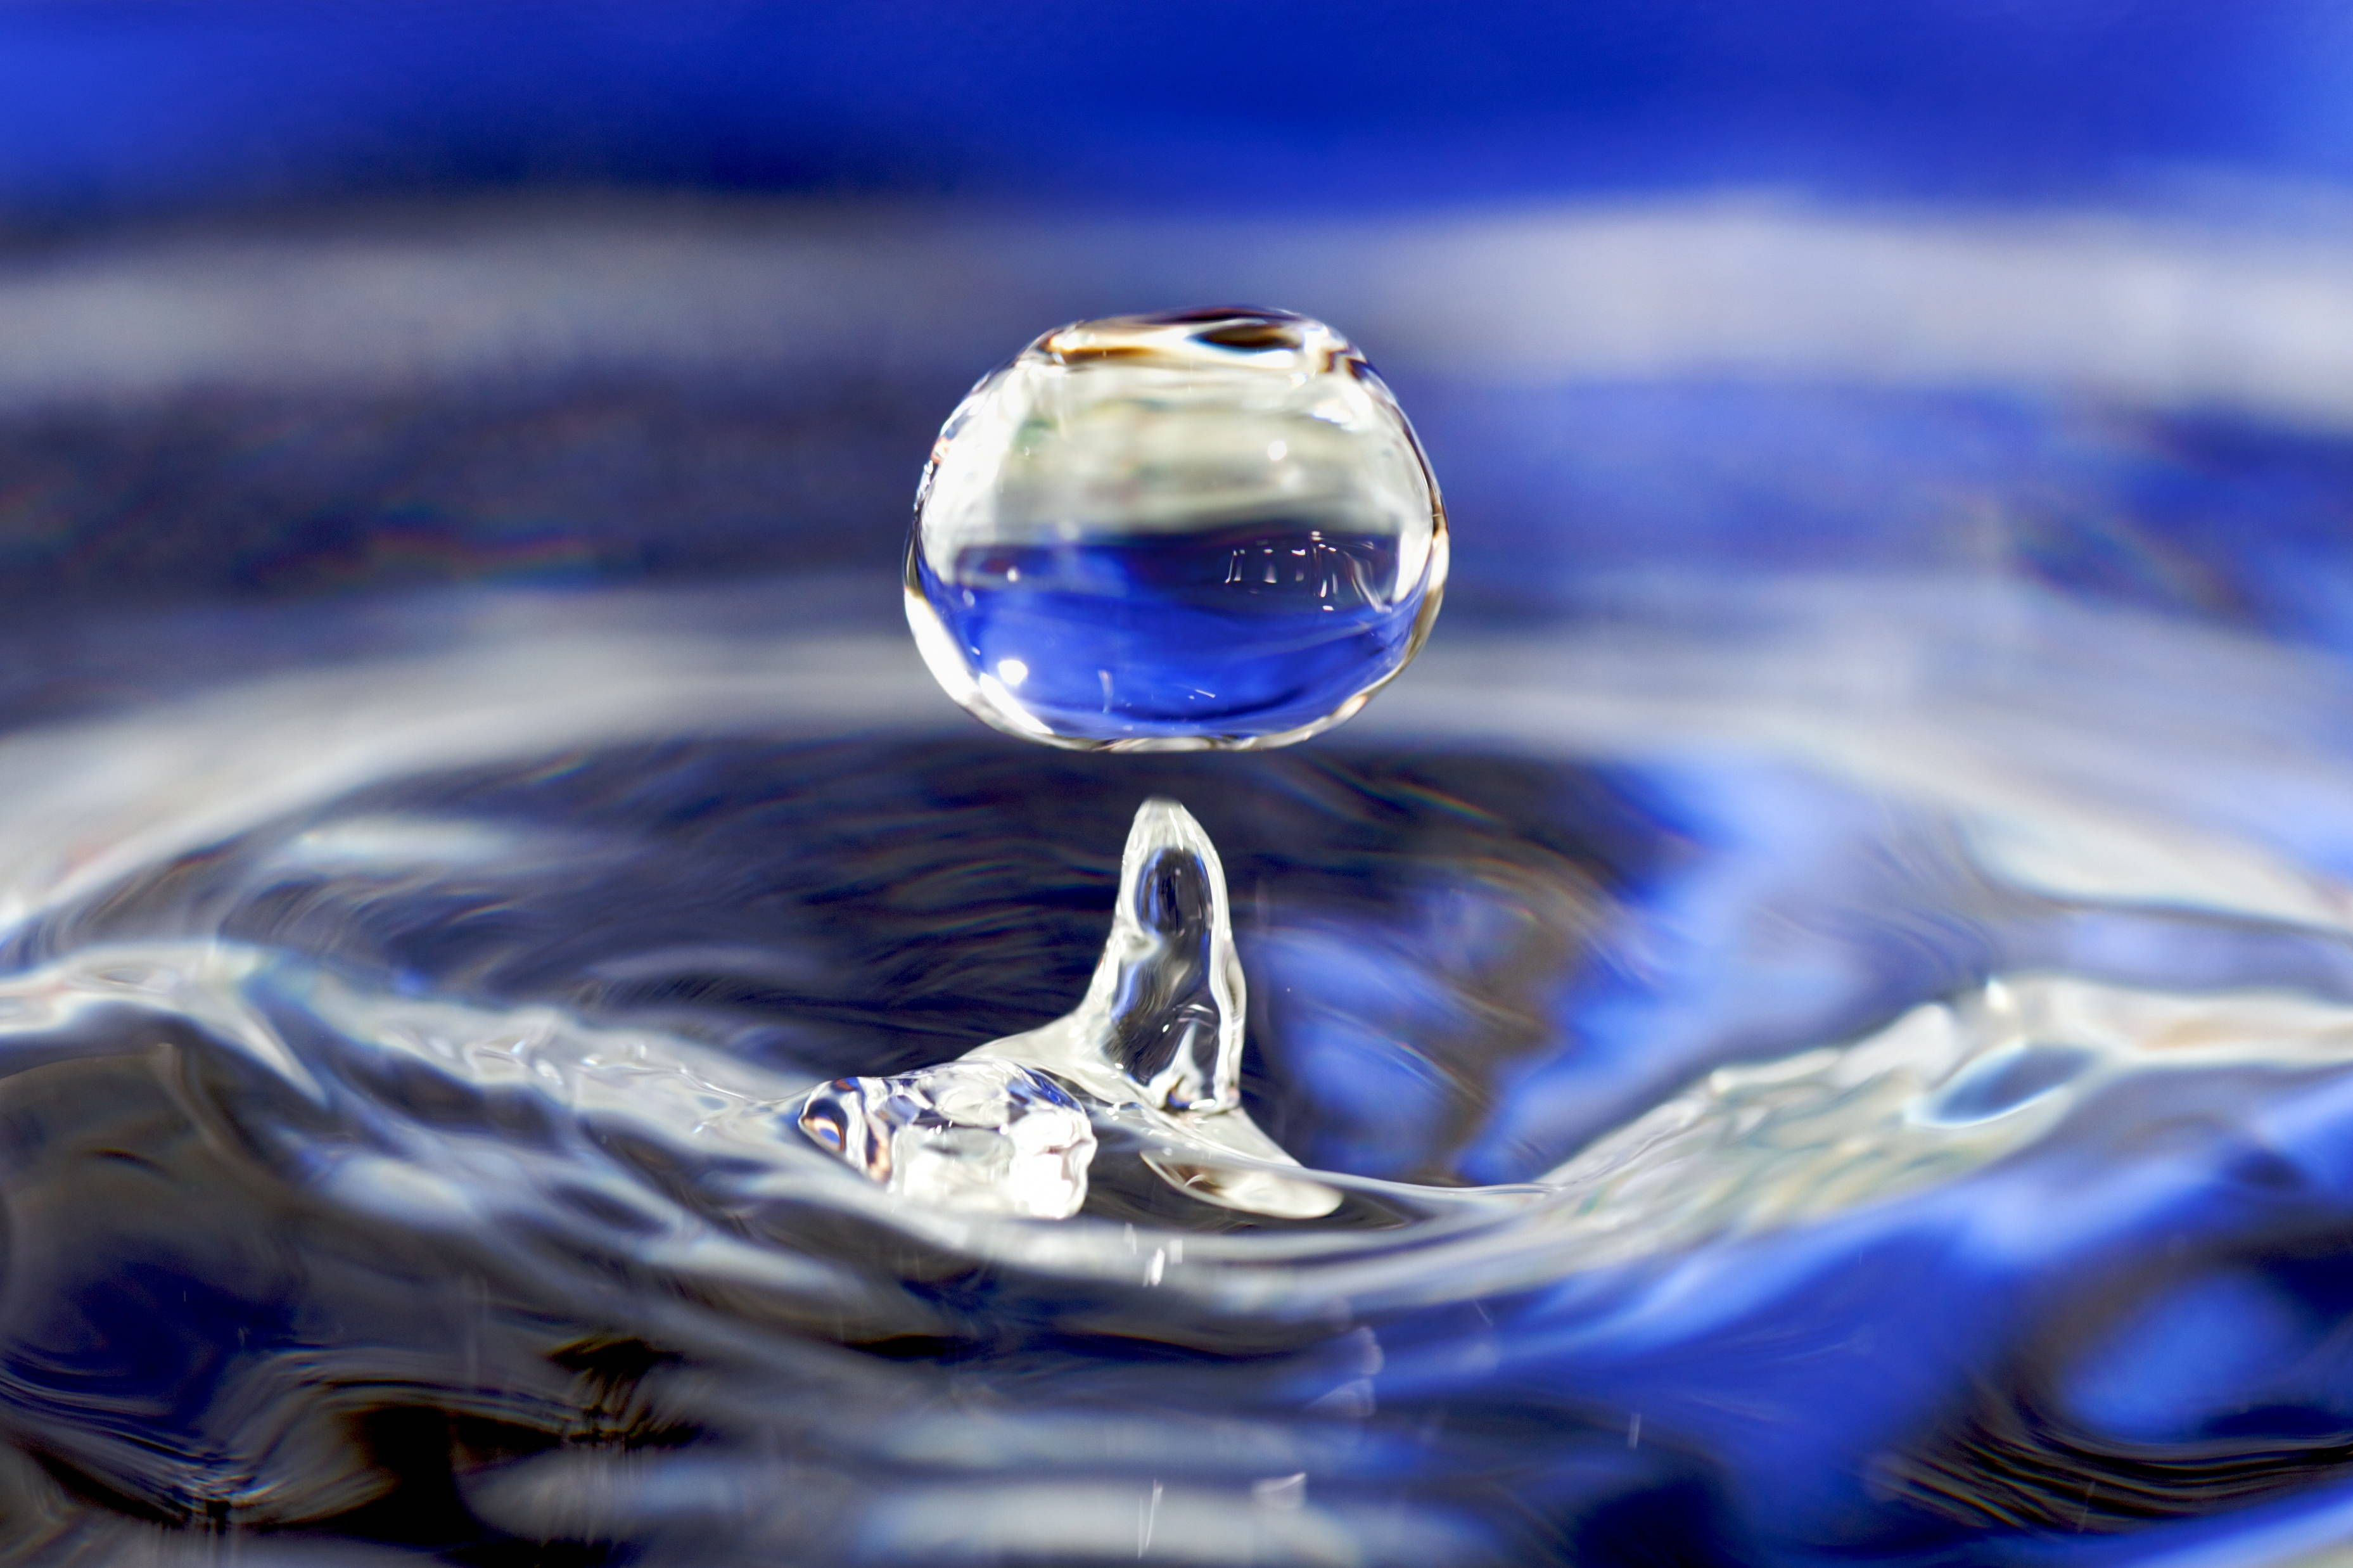 Water drop, 2012. Source: Wikimedia Commons.